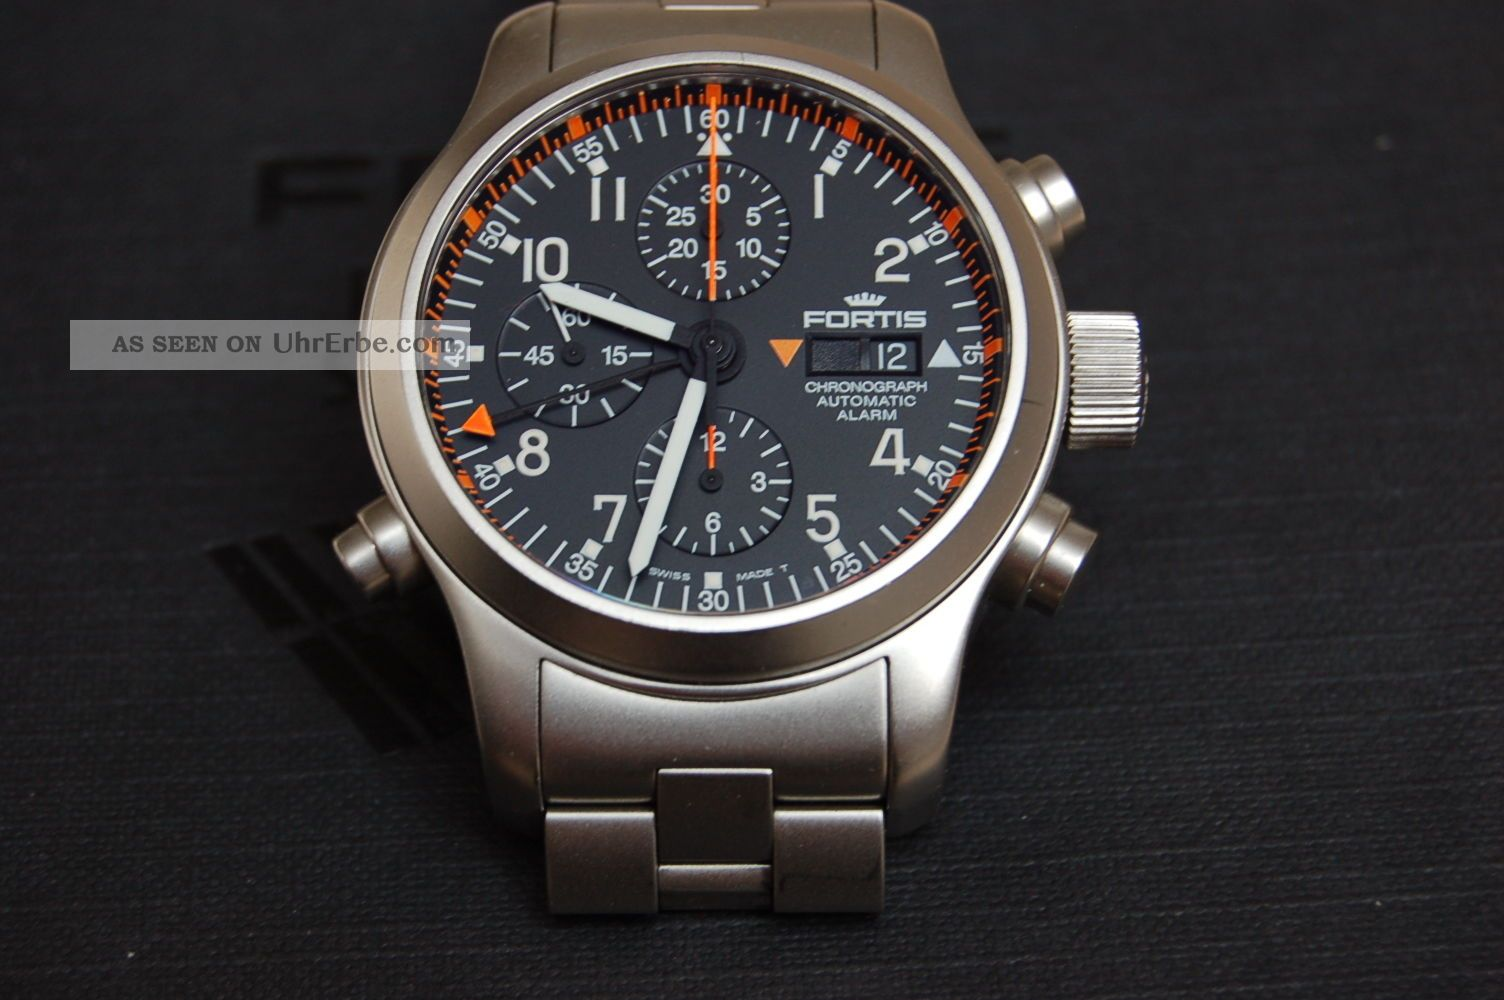 Fortis B - 42 Pilot Professionel Chronograph Alarm Np 7595.  - Armbanduhren Bild